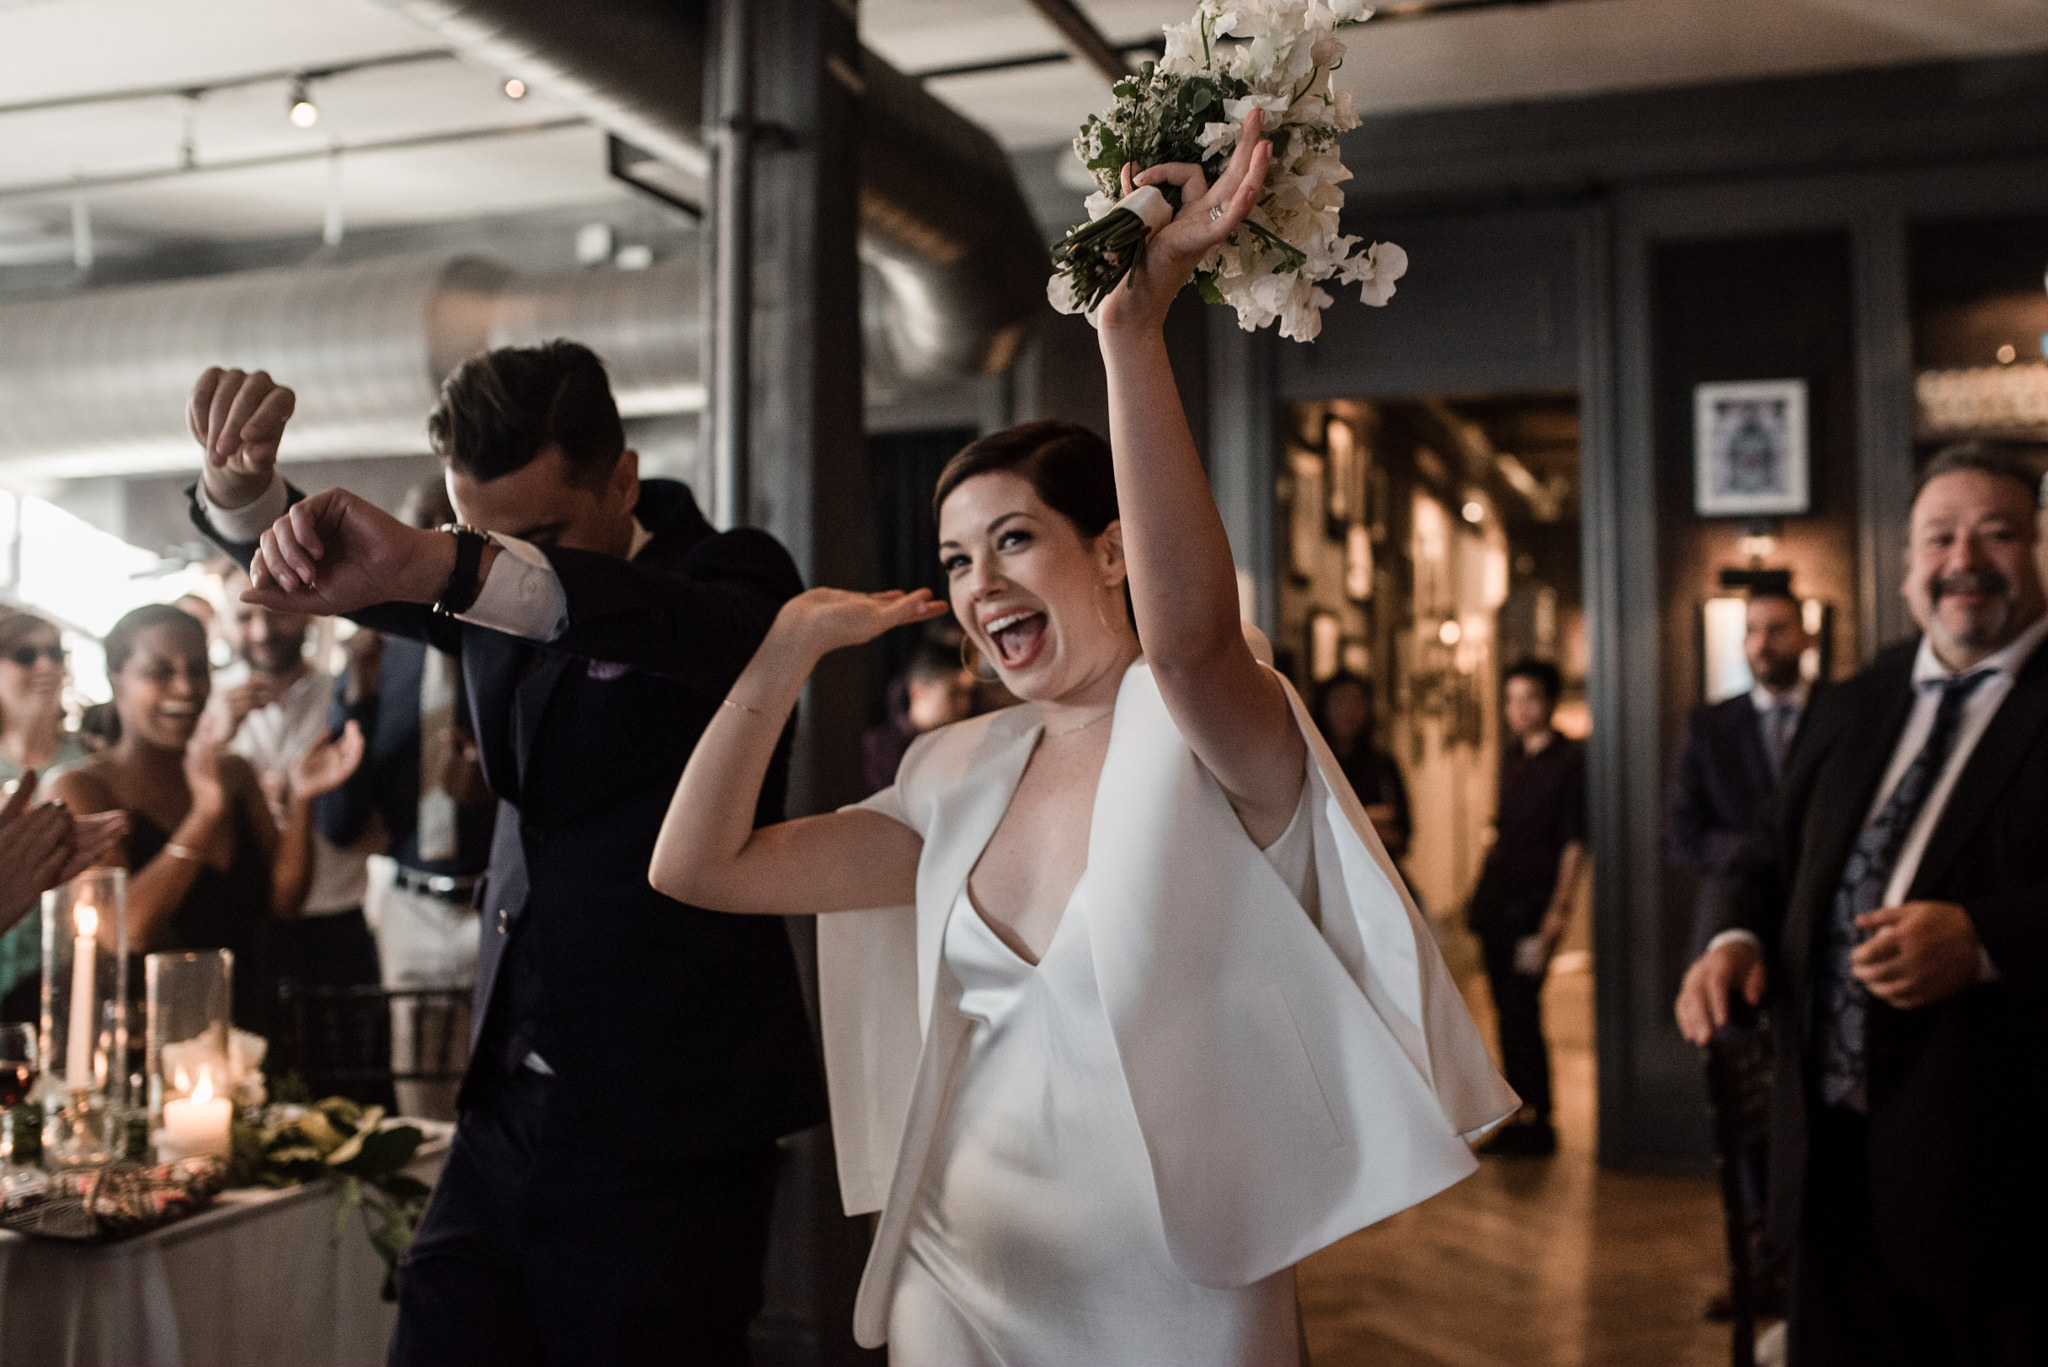 081-bride-groom-entrance-storys-building-industrial-wedding-toronto.jpg